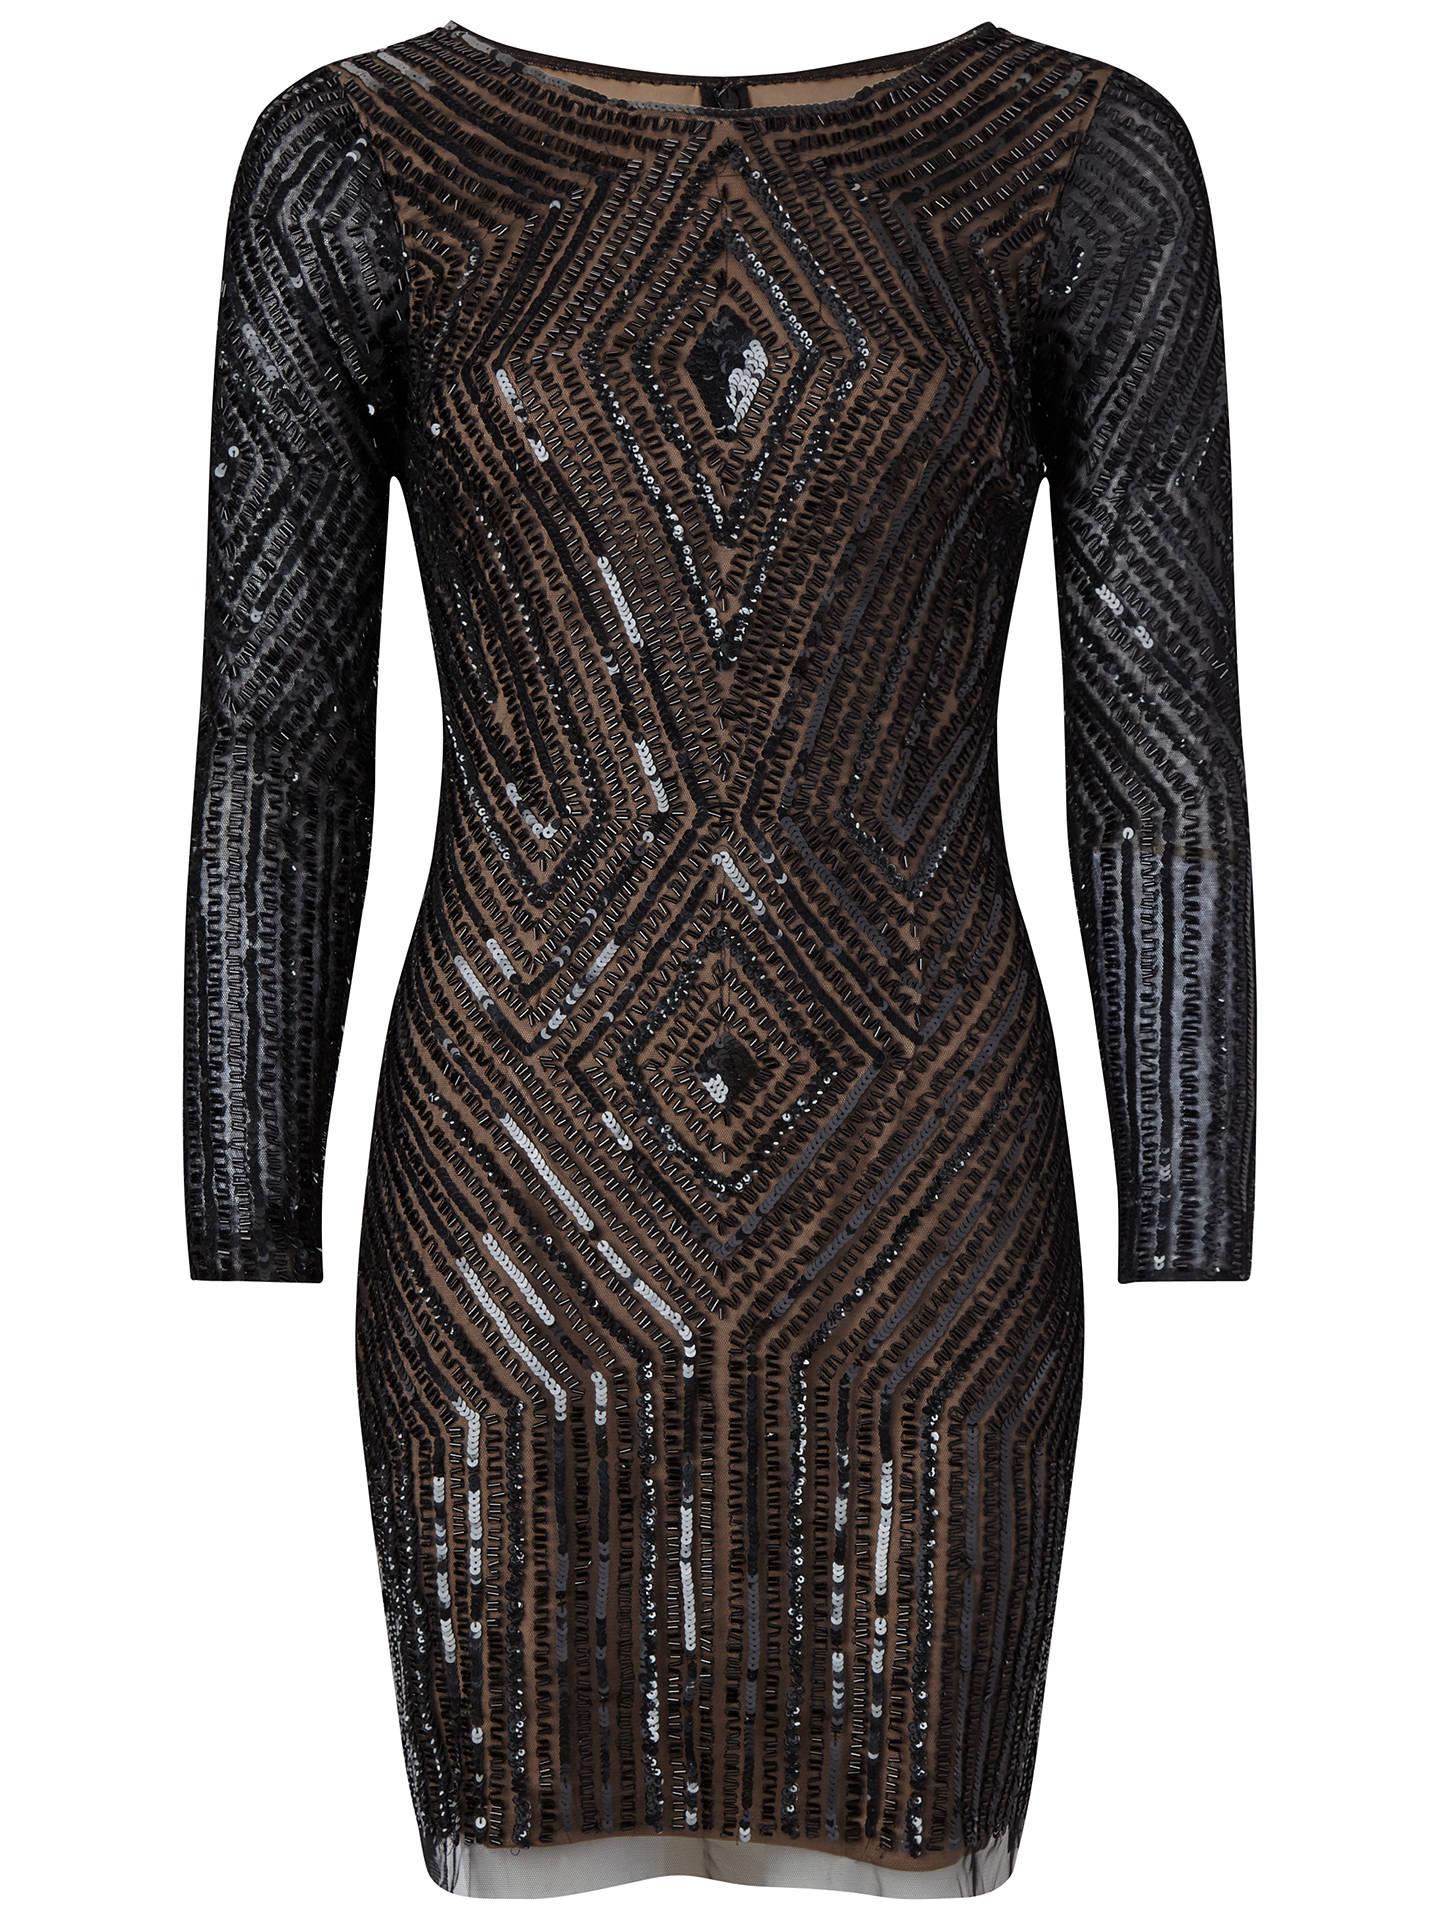 35ce014772 Adrianna Papell Diamond Beaded Cocktail Dress